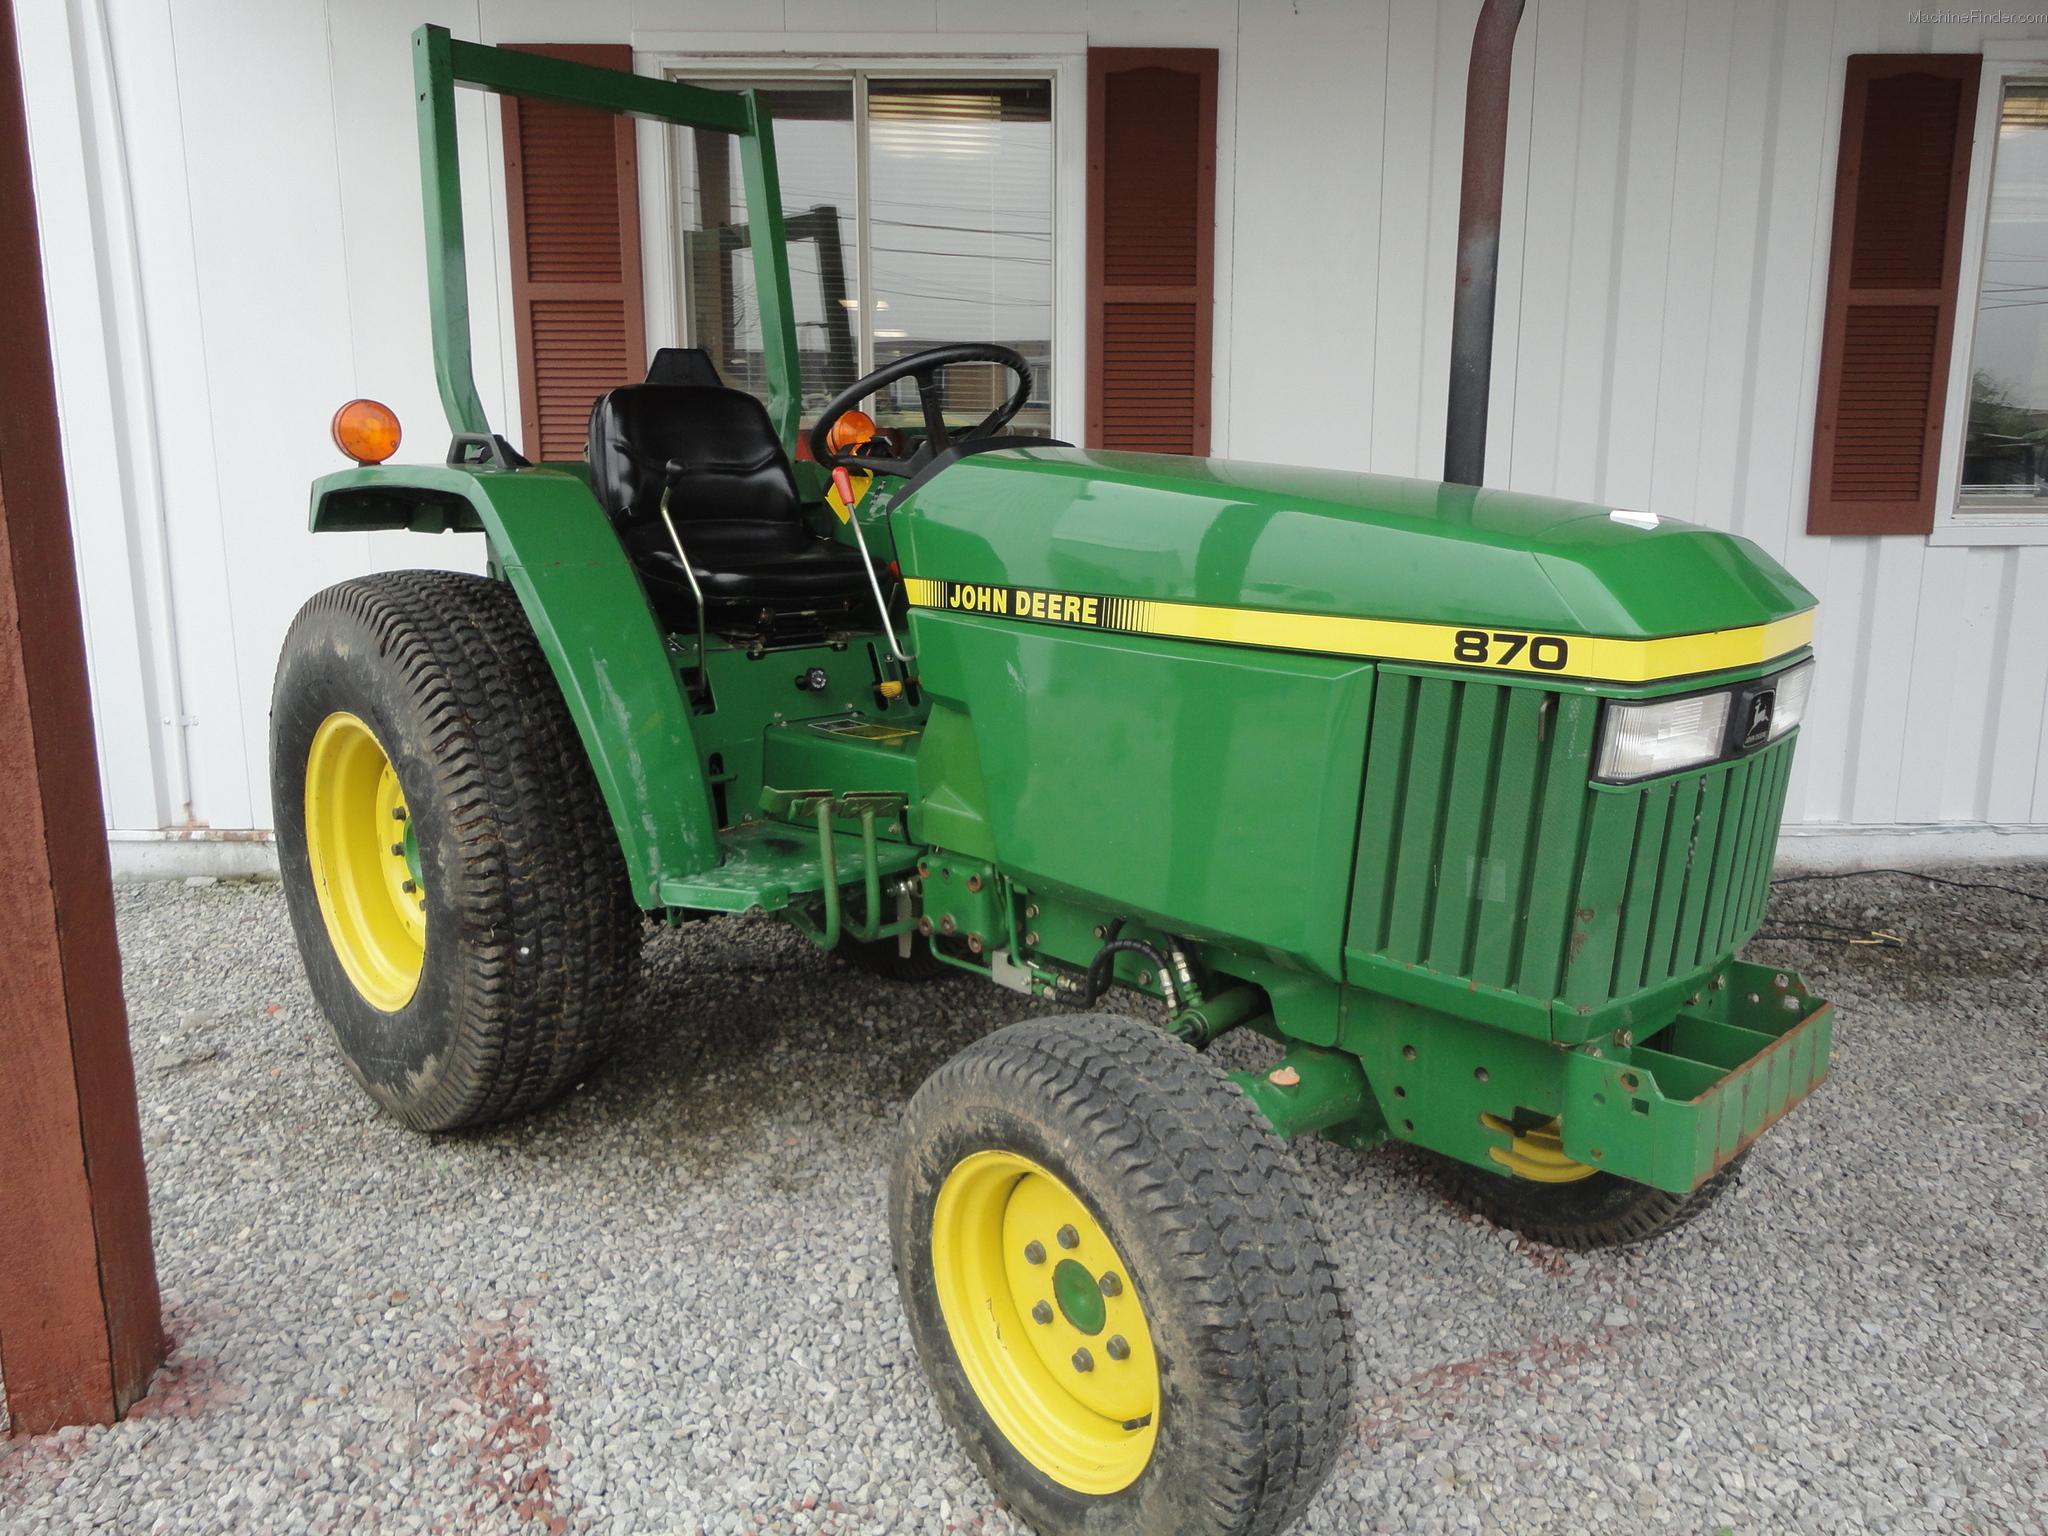 1995 John Deere 870 Tractors - Compact (1-40hp.) - John ...